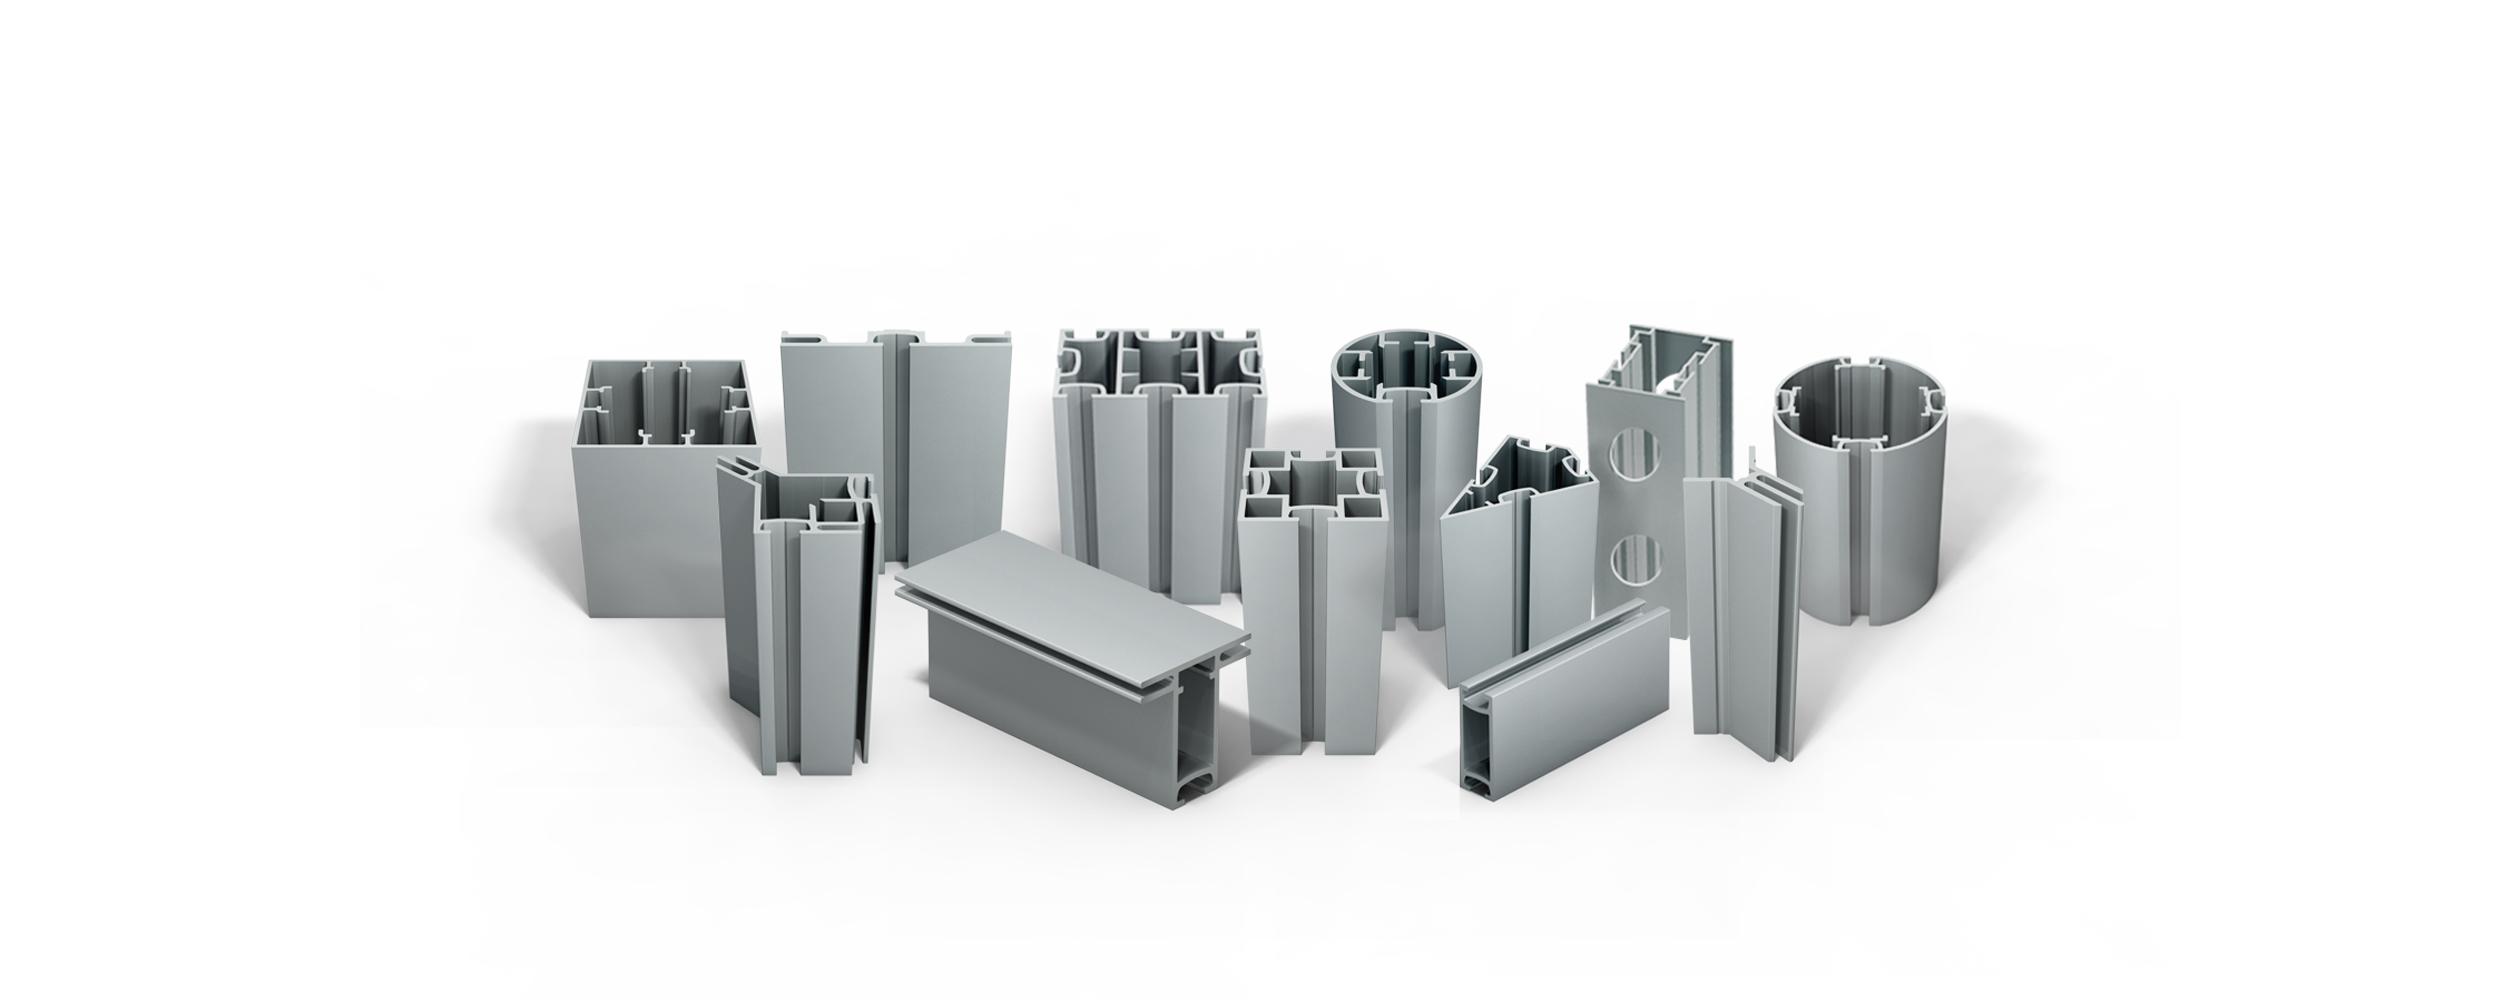 Aluminum-based Wholesale Exhibit Manufacturing   Agam Group